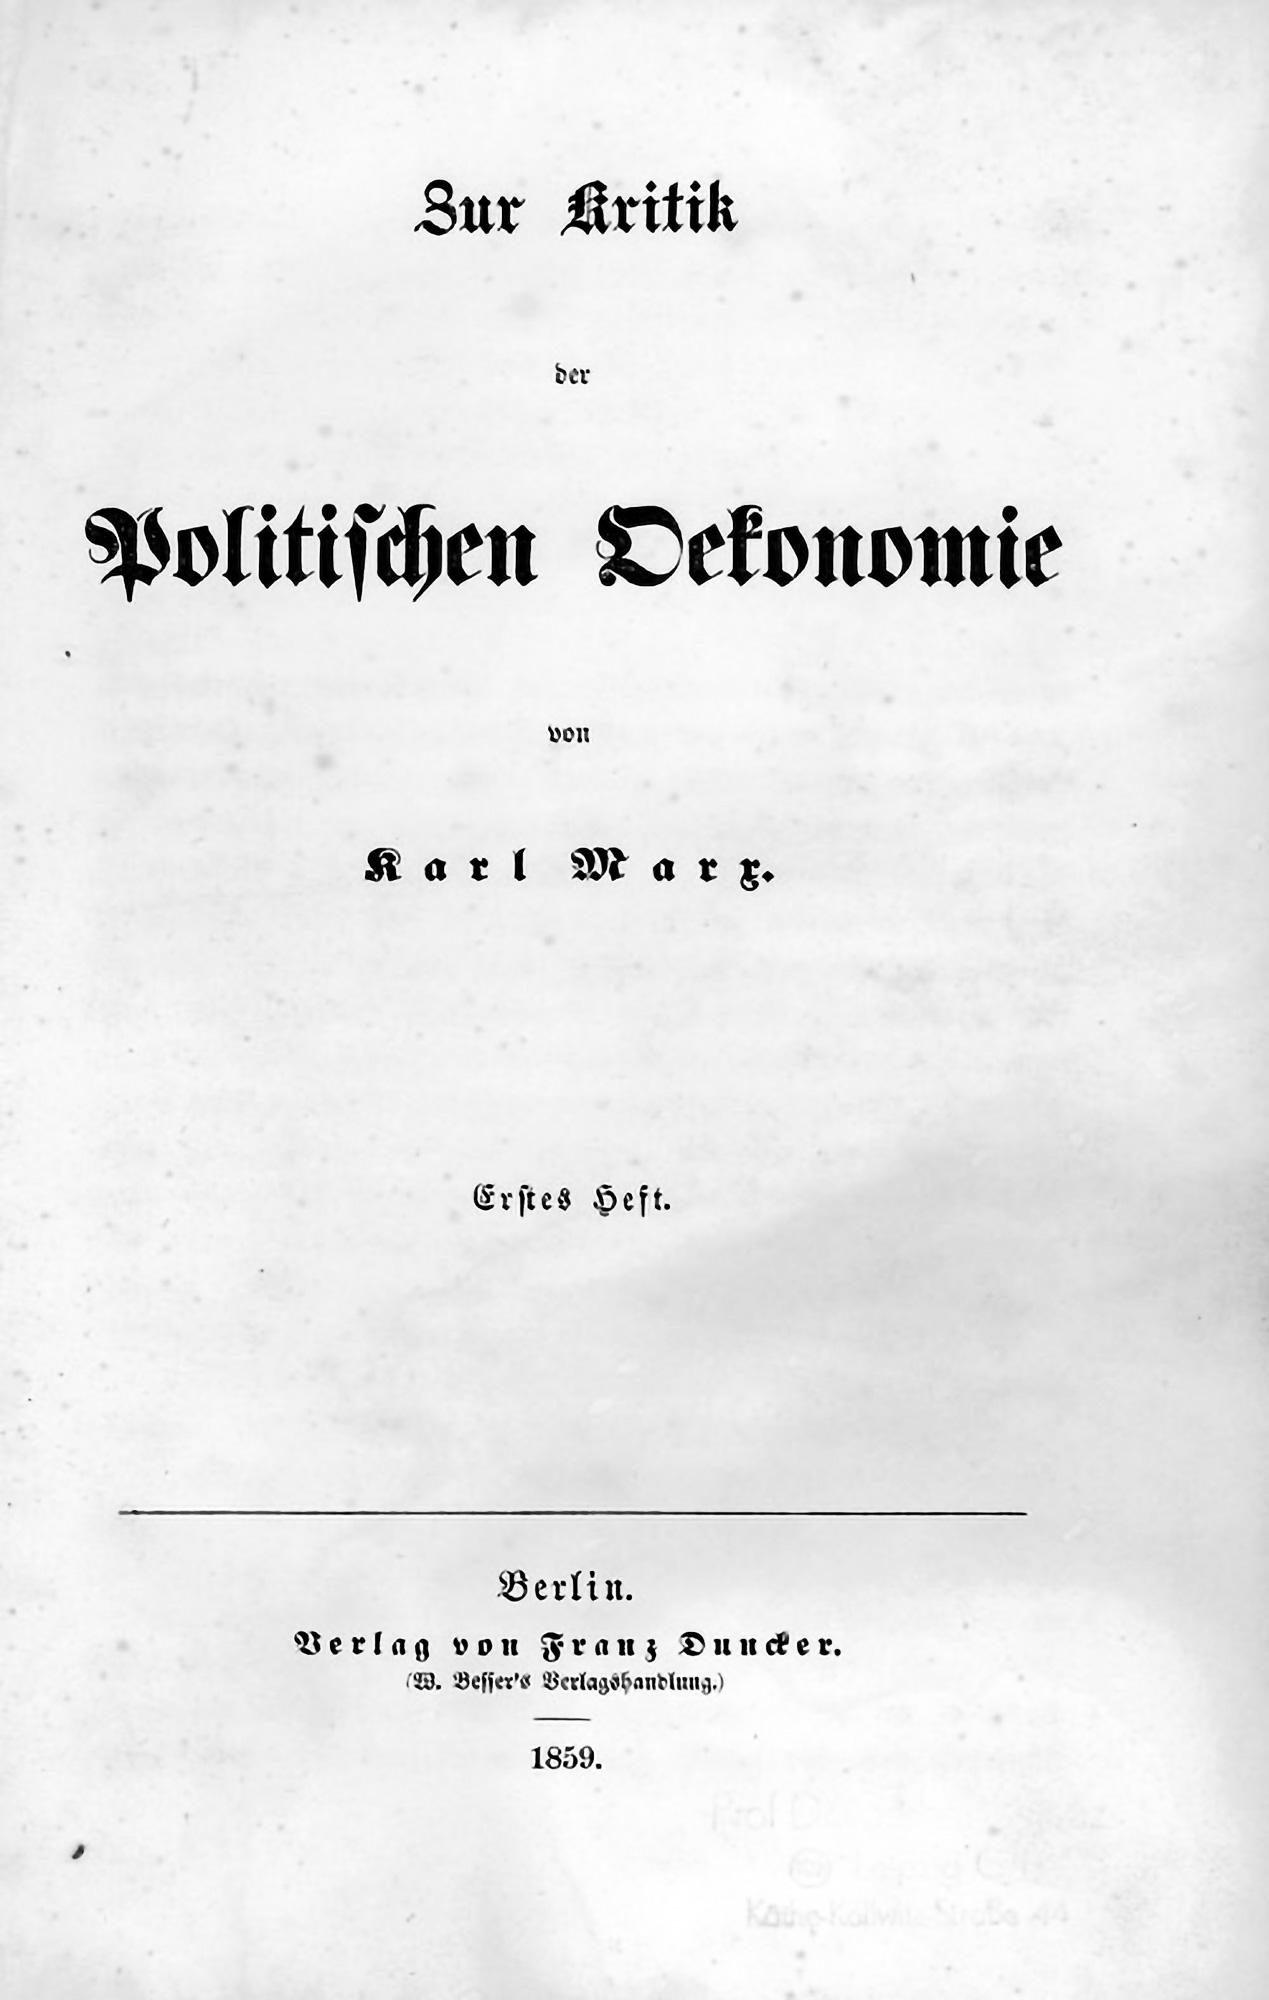 SP_Marx-zur-kritik-1859-2000 x 3152-LR-Jonas.jpg